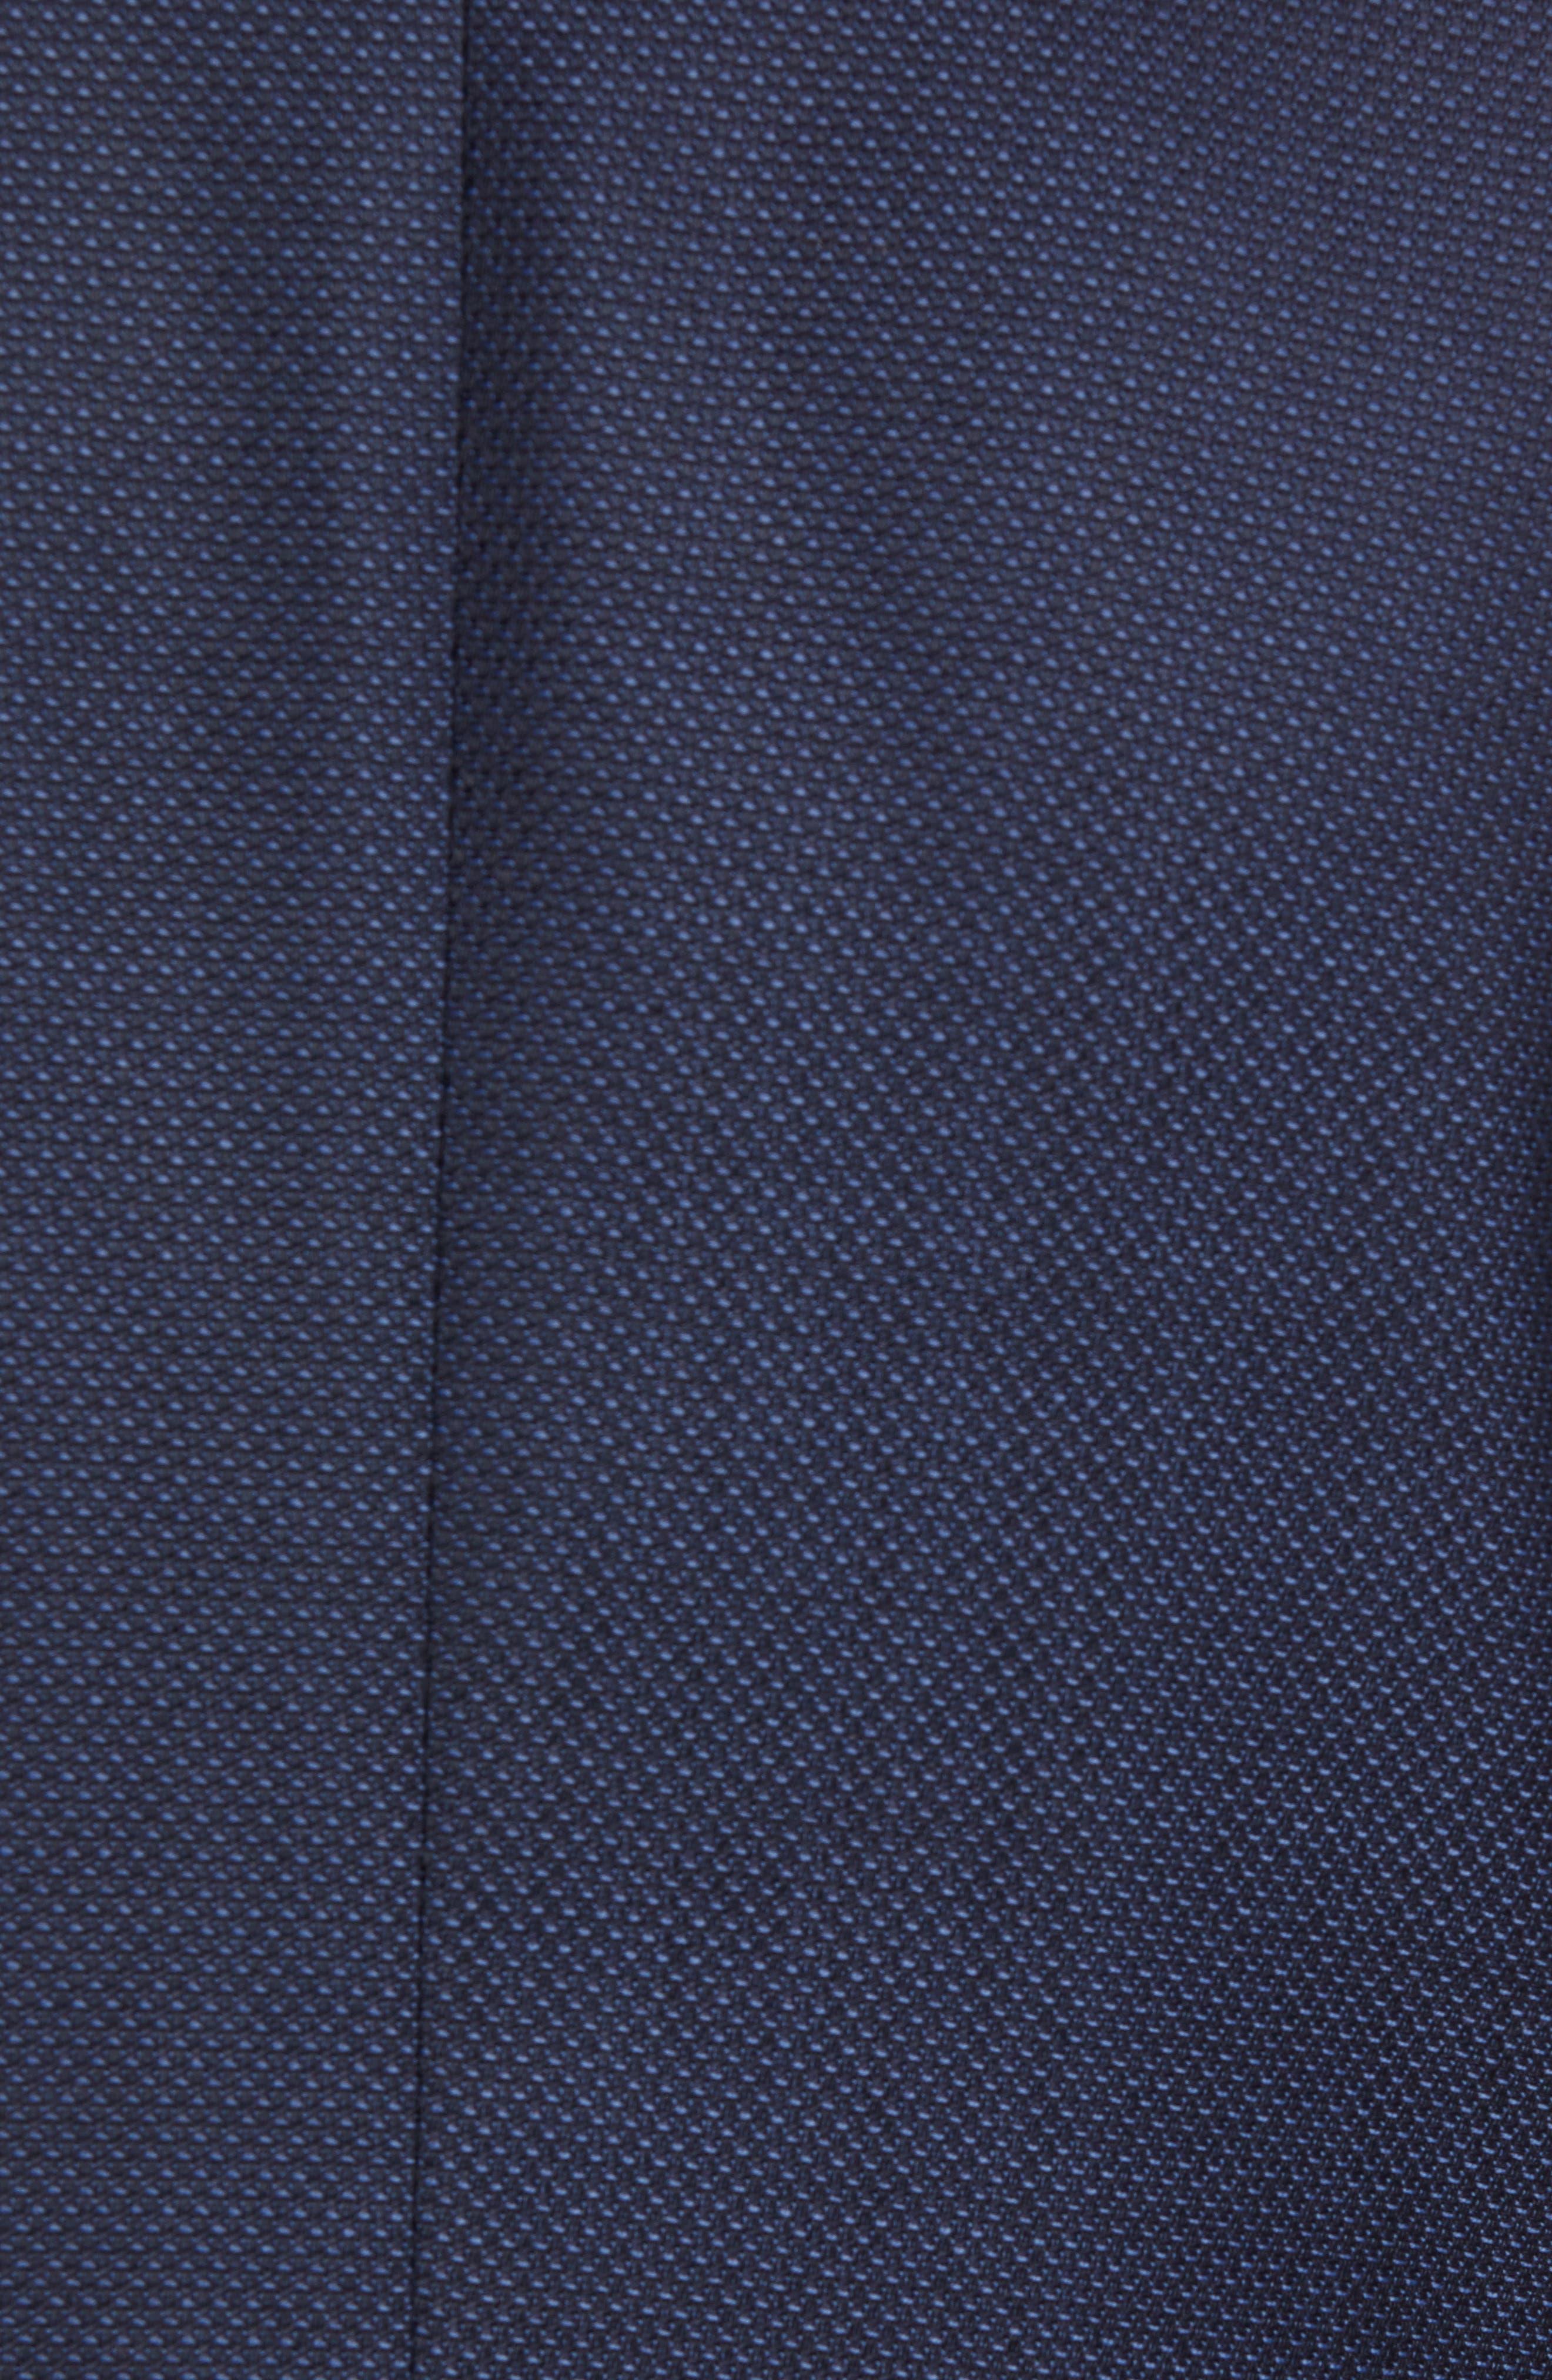 Nobis Trim Fit Wool Blazer,                             Alternate thumbnail 6, color,                             NAVY